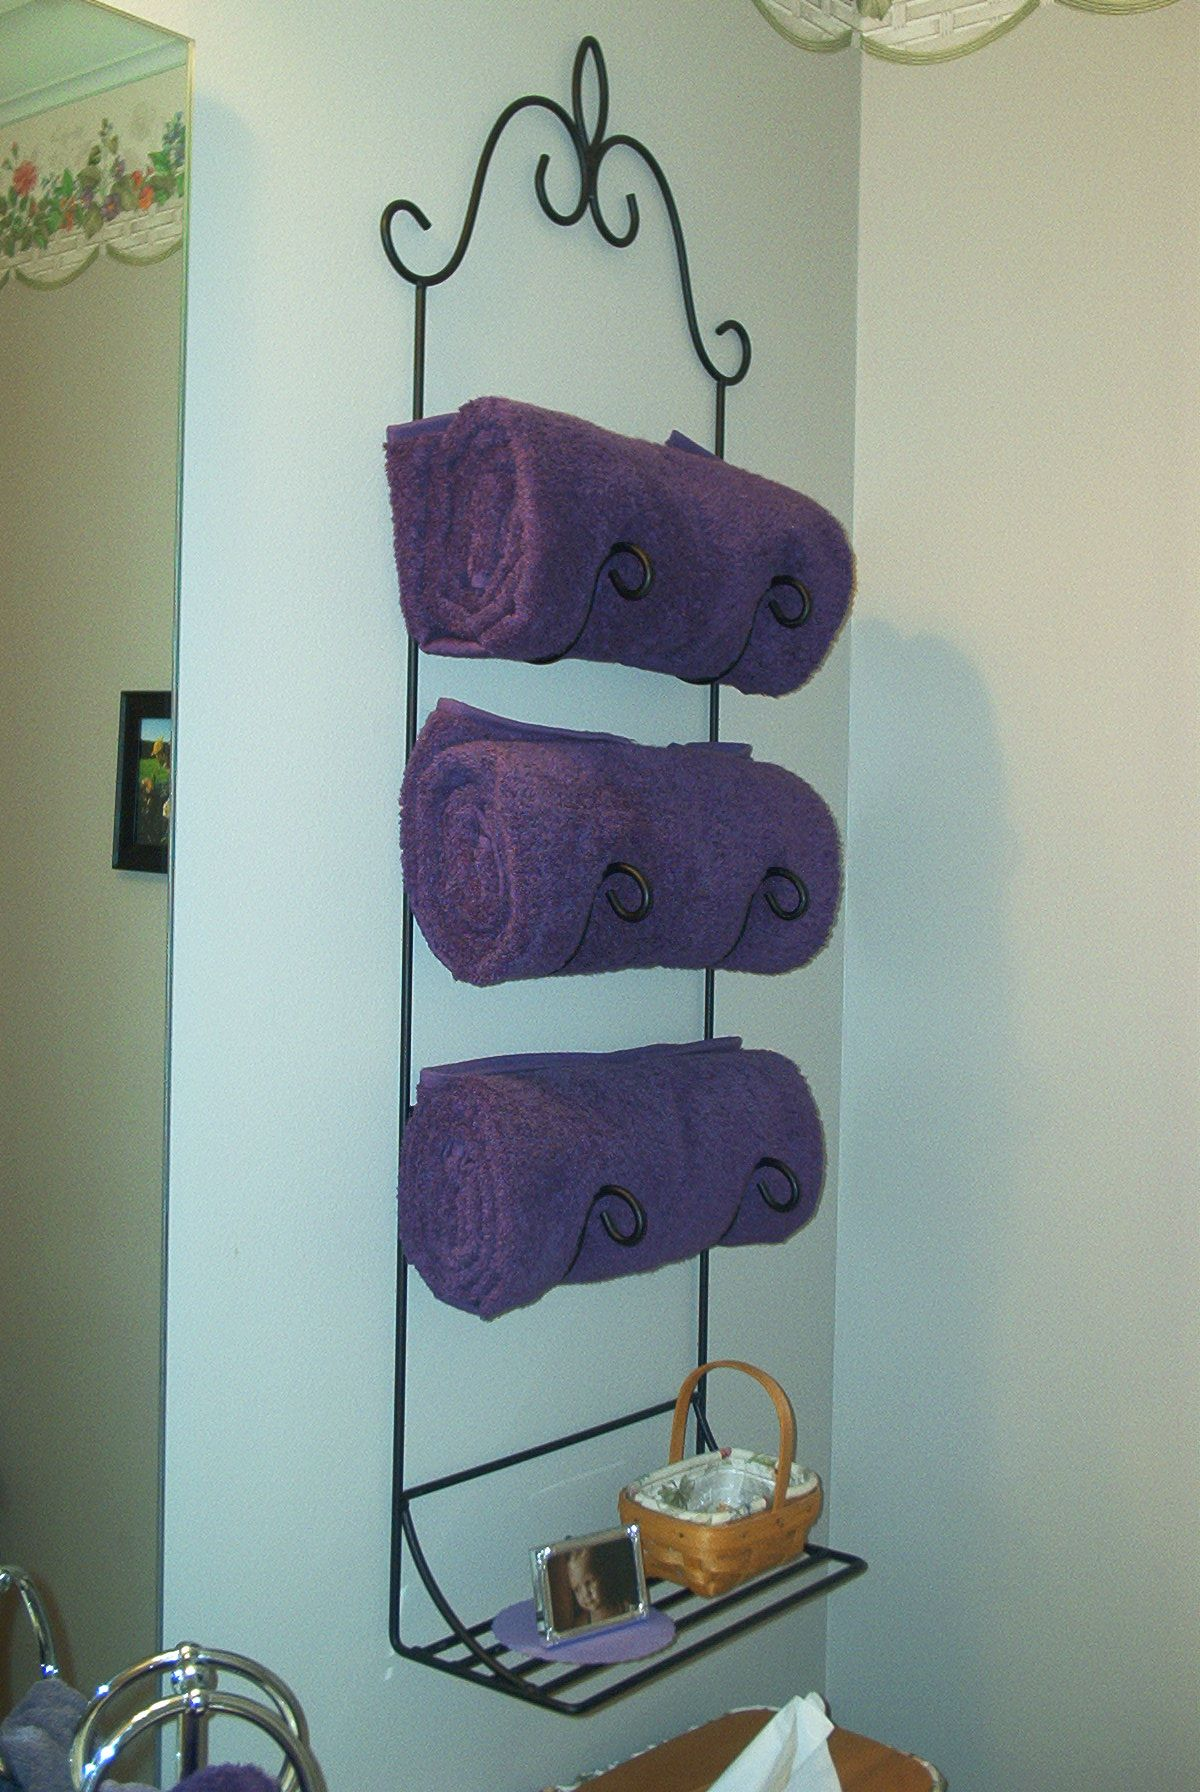 Awesome Metal Towel Shelf Frieze - Bathtub Ideas - dilata.info